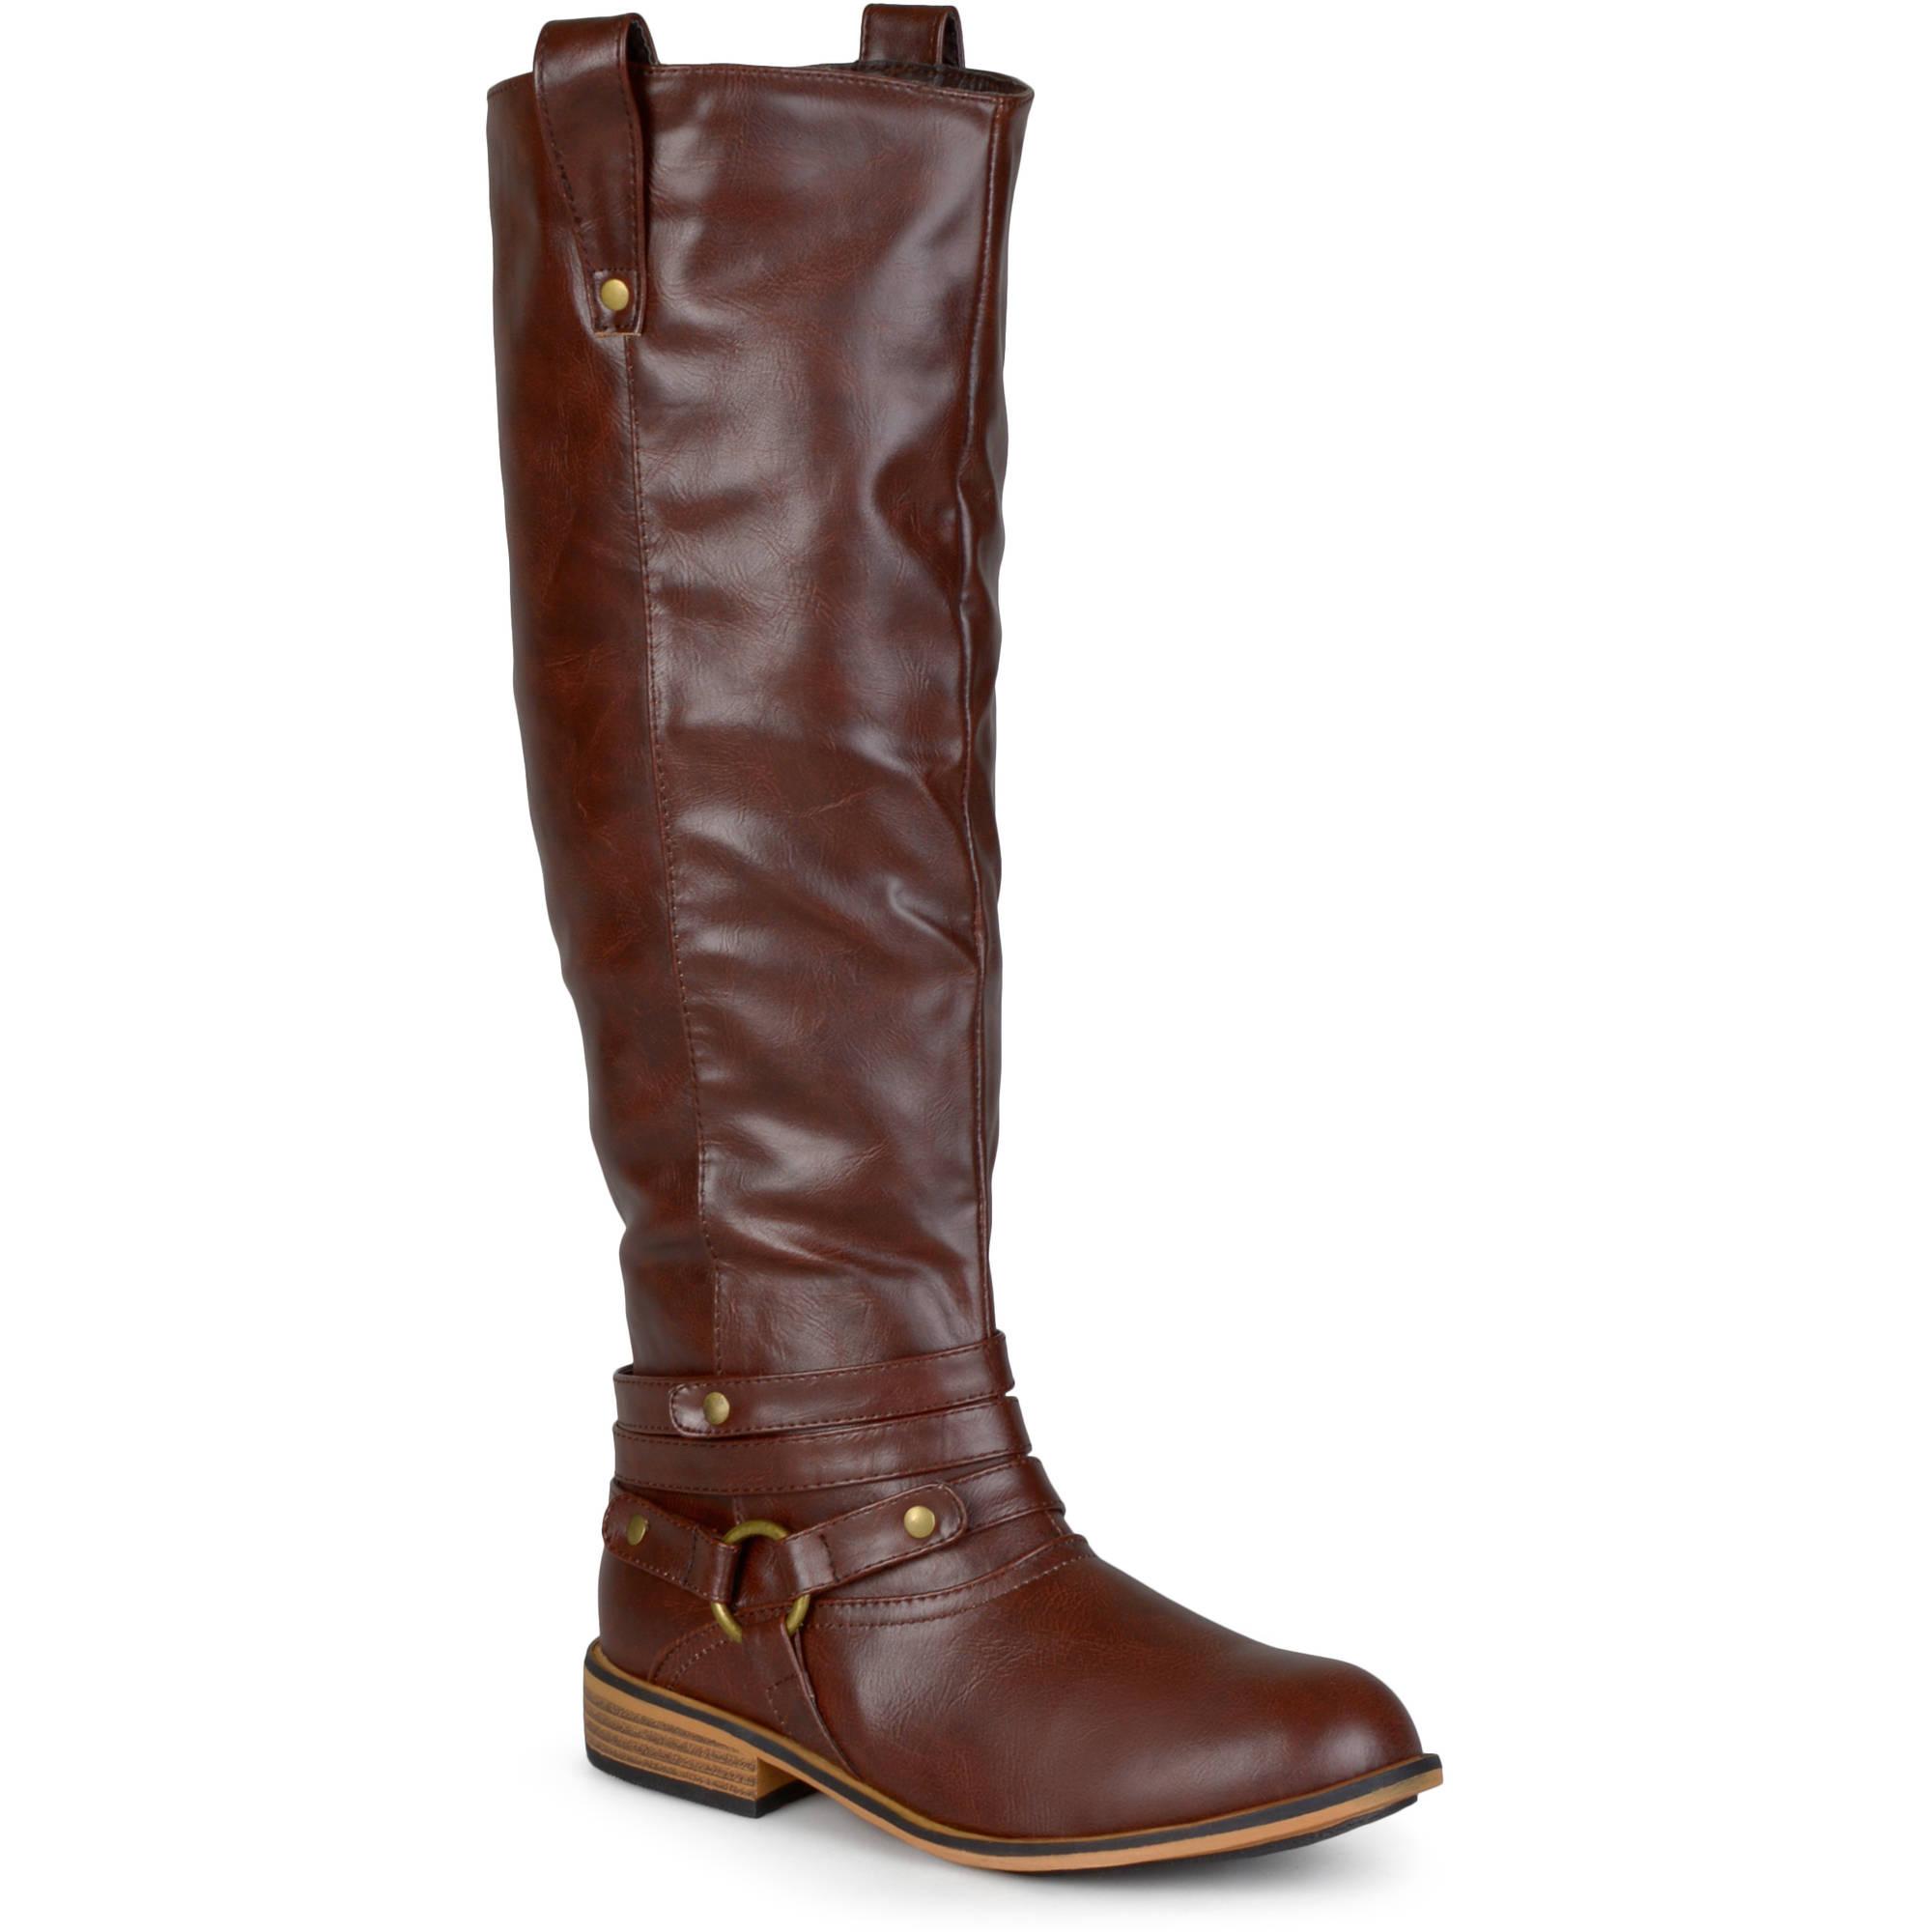 Brinley Co. Women's Mid-calf Riding Boots - Walmart.com